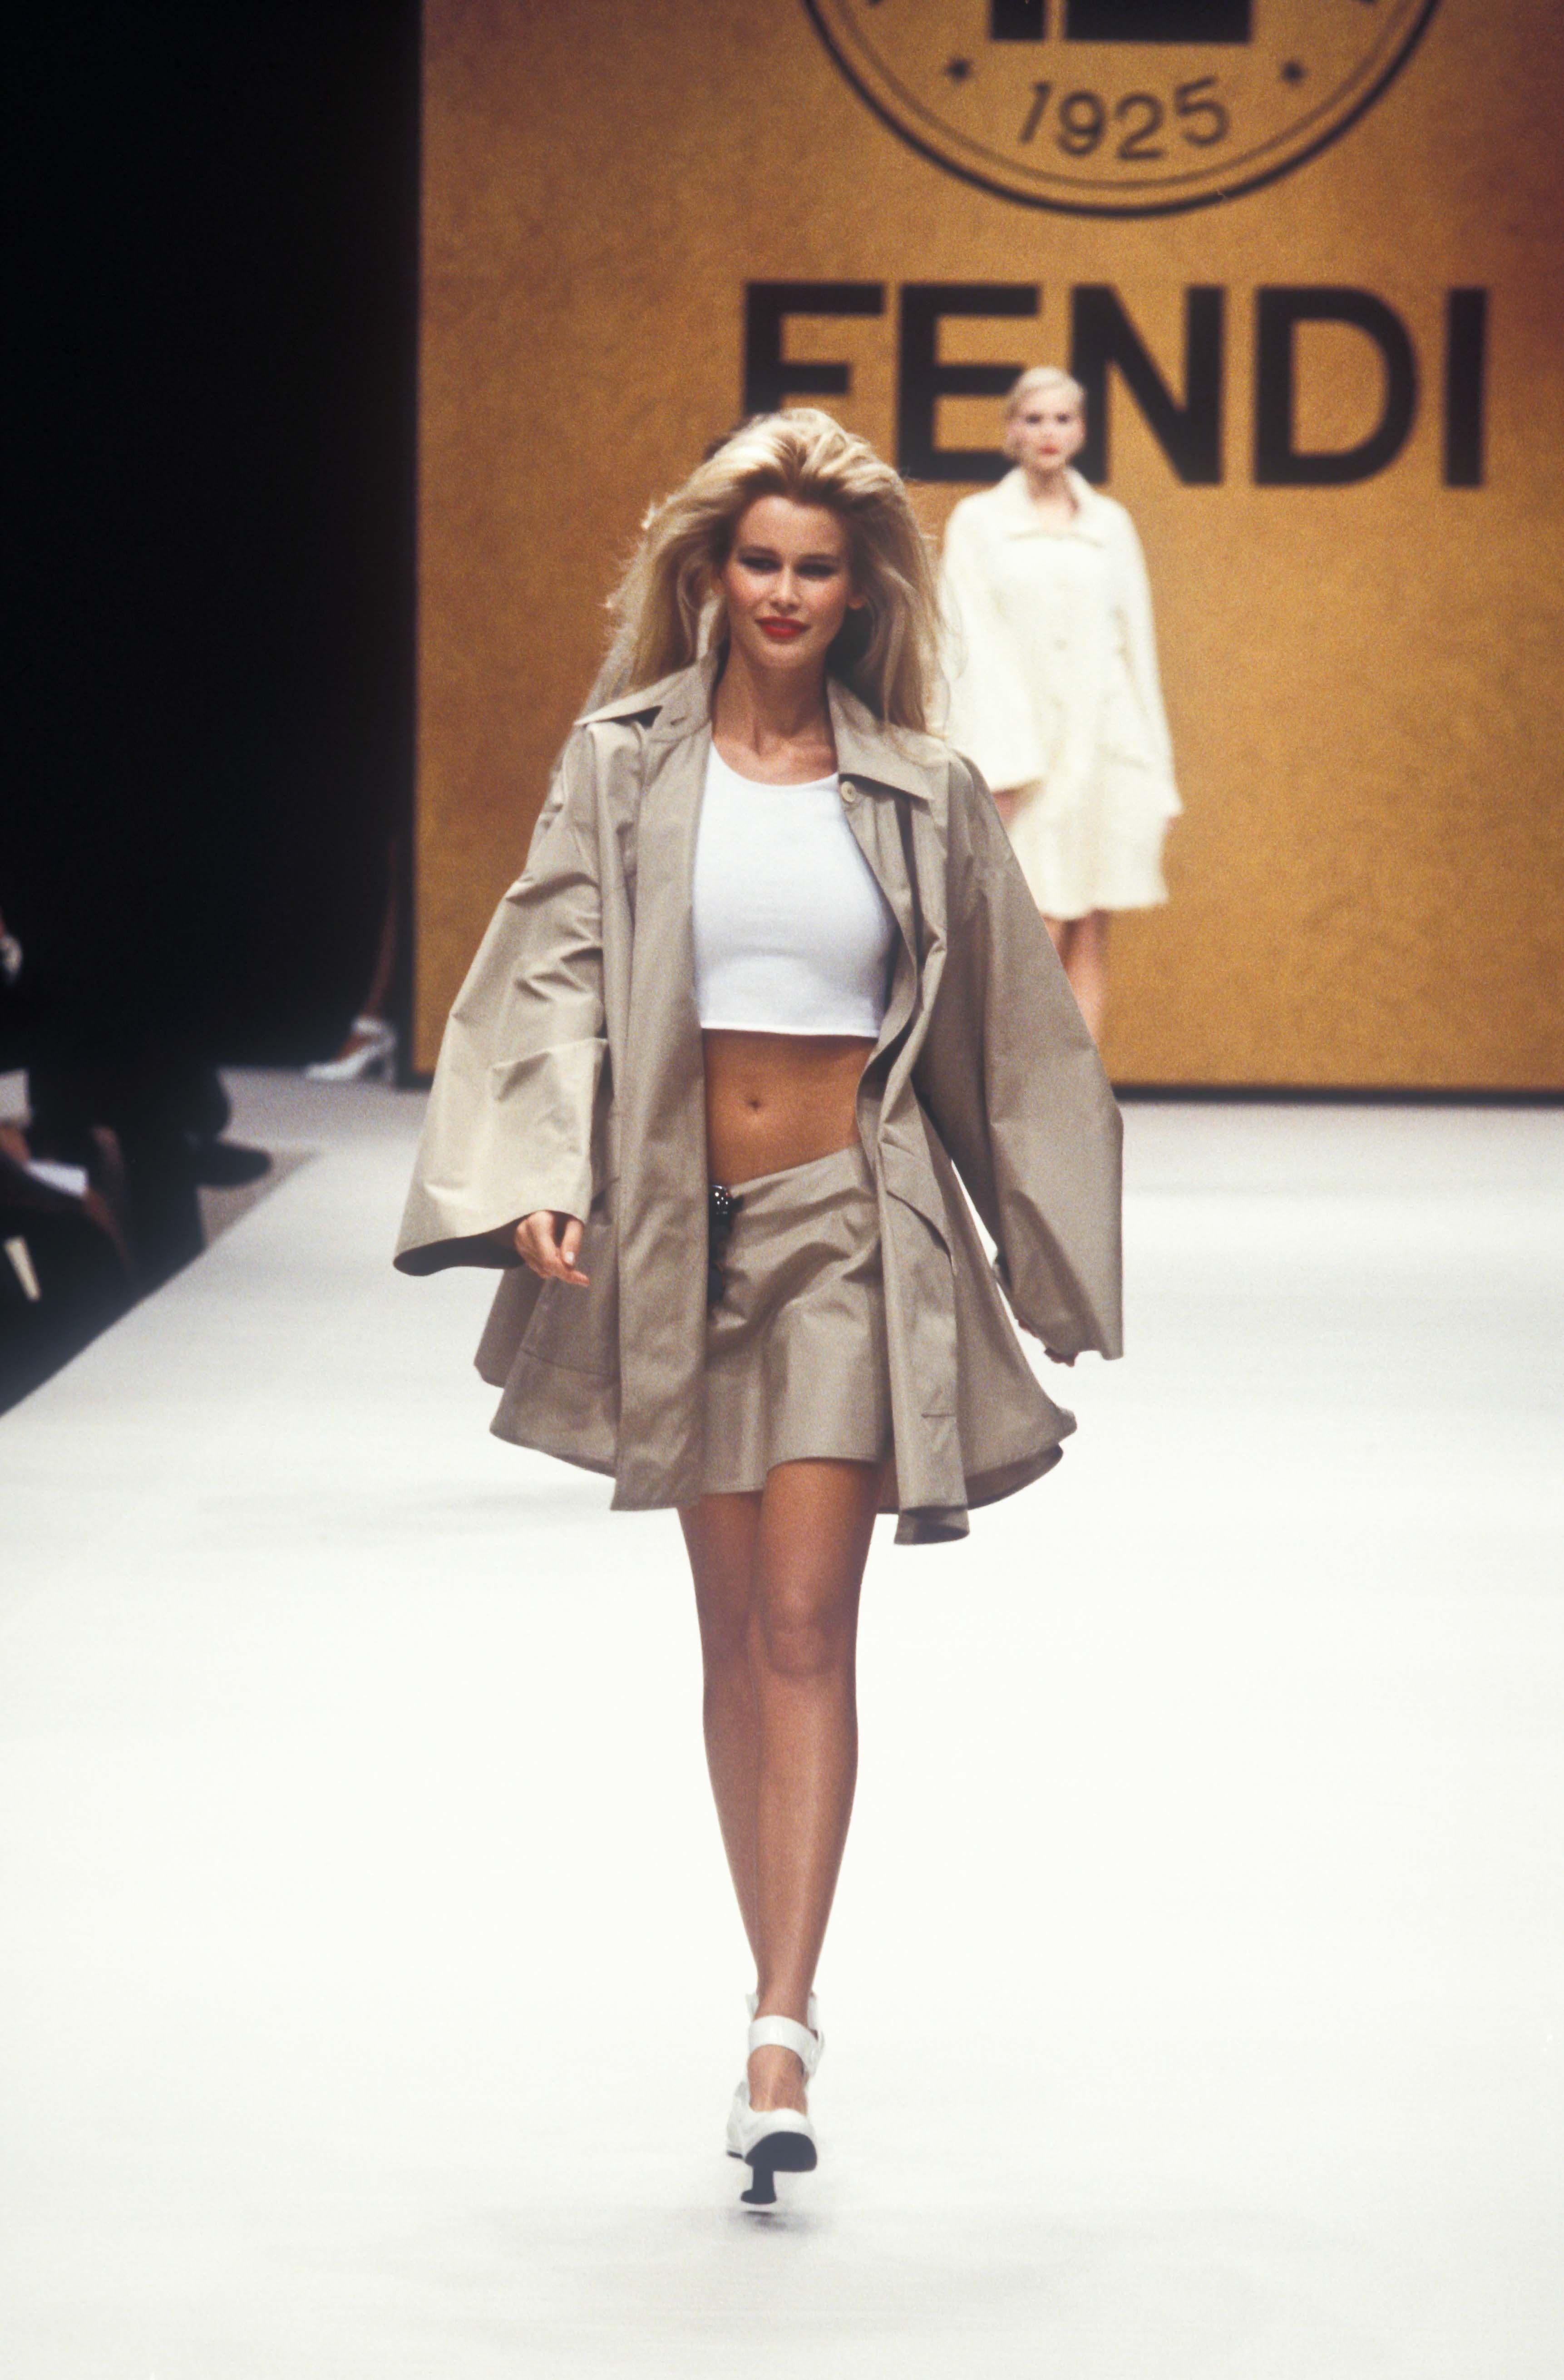 Claudia Schiffer Fendi Runway Show Rtw Spring Summer 1995 Claudia Schiffer Fendi Runway Show Rtw Sprin In 2020 Sweaters Women Fashion Fashion Runway Fashion Dresses